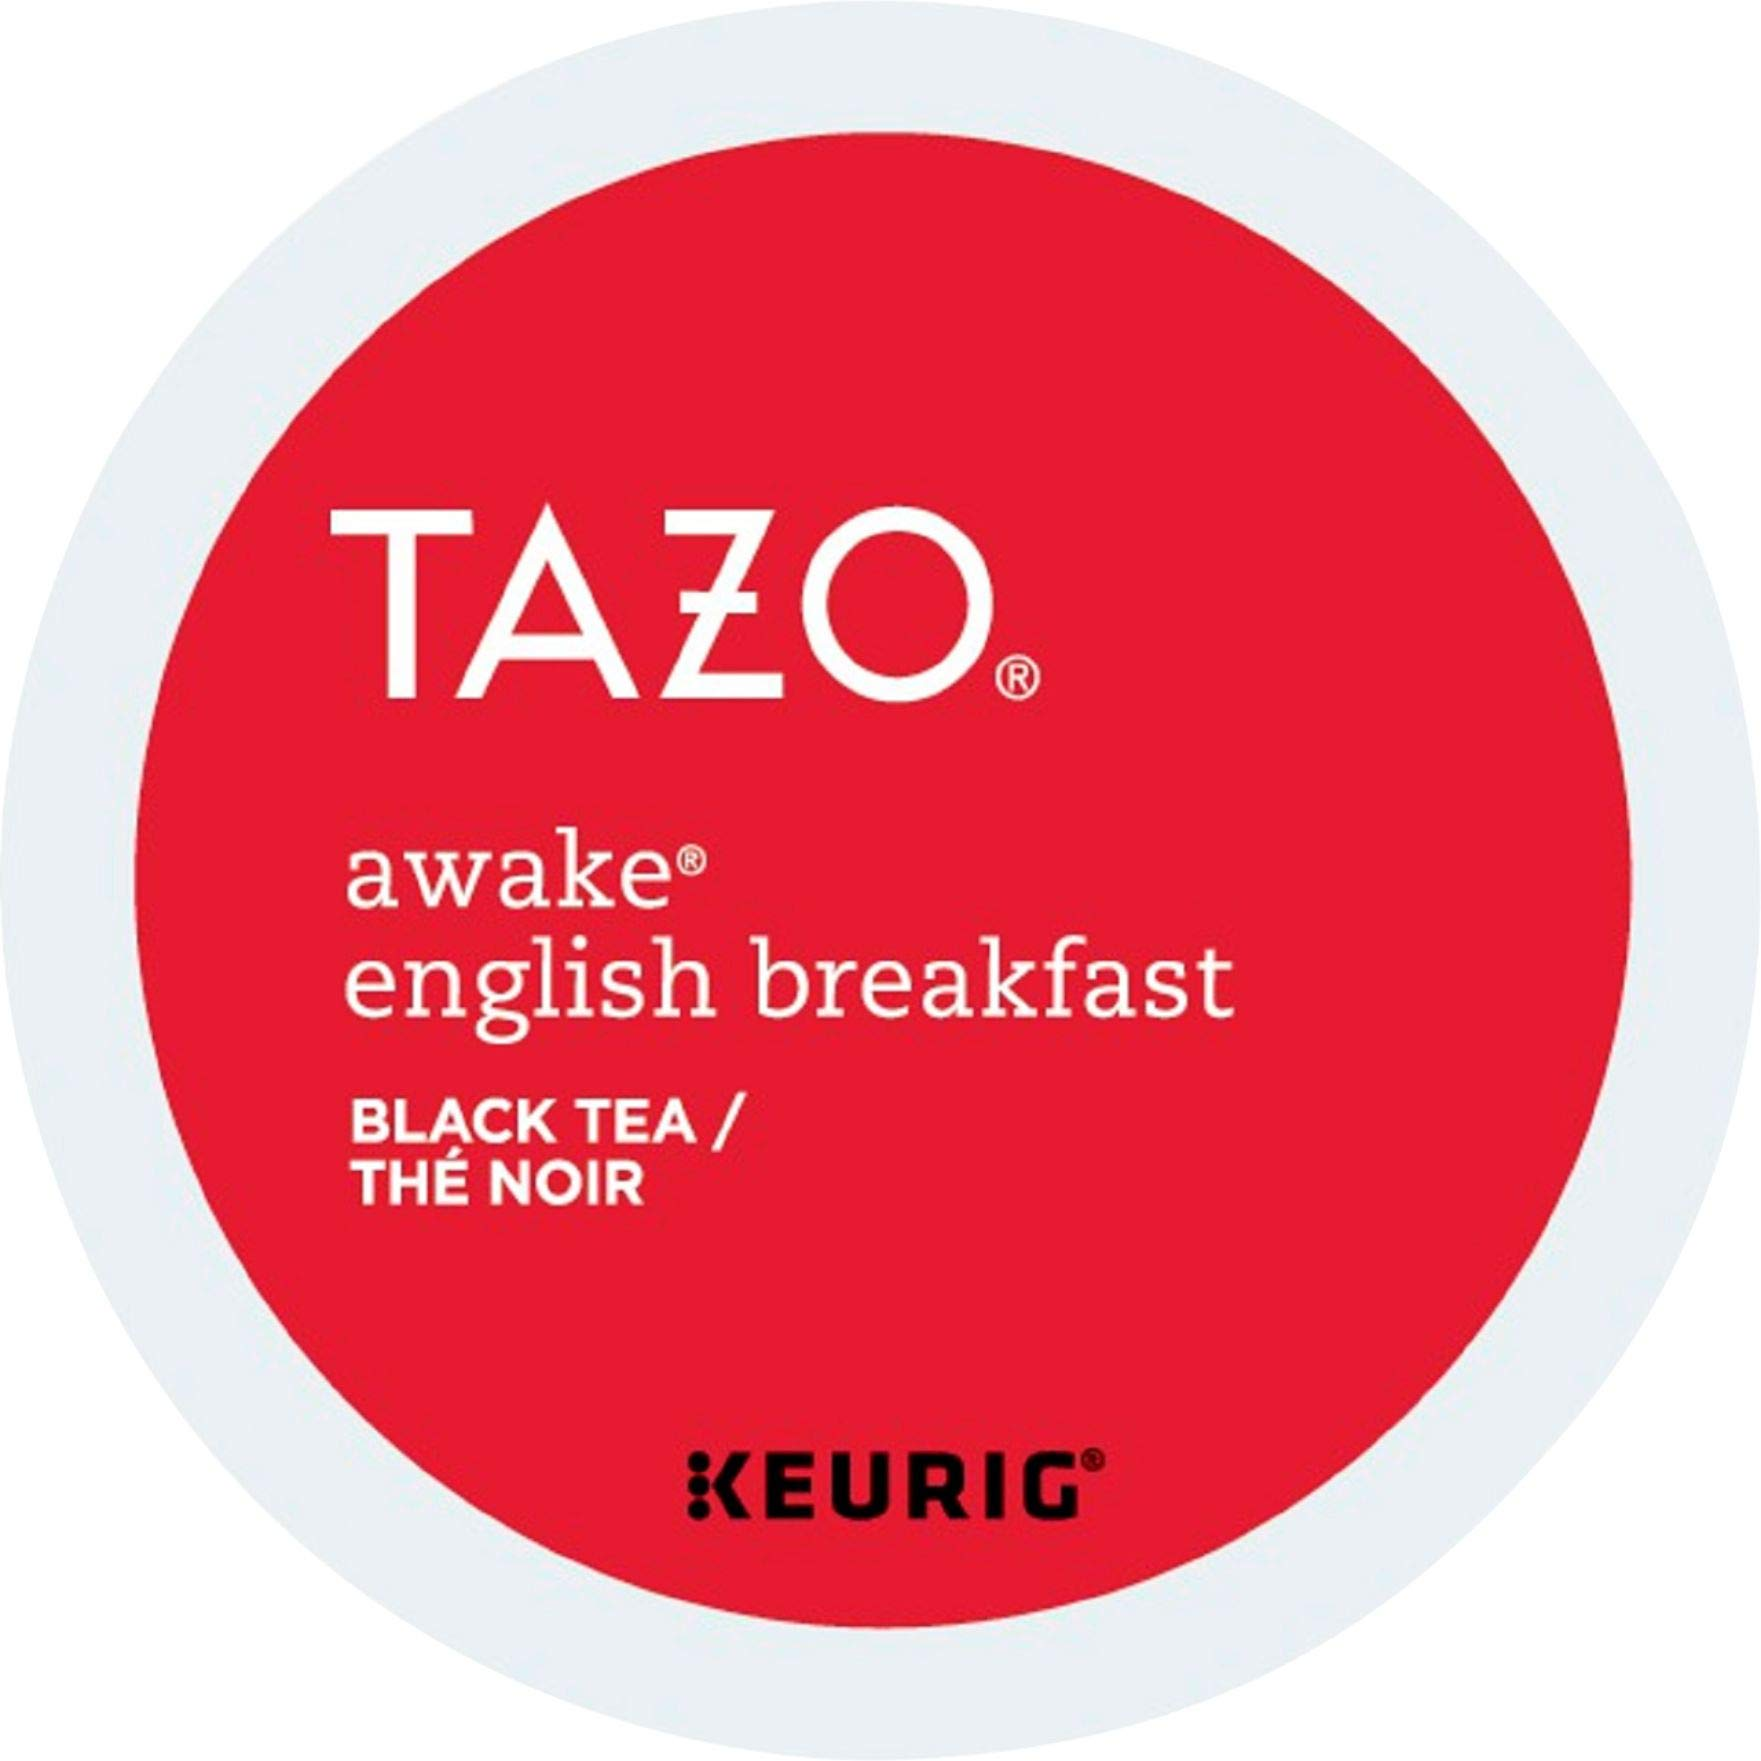 Tazo Awake English Breakfast Black Tea K-Cups, 96 Count by Tazo